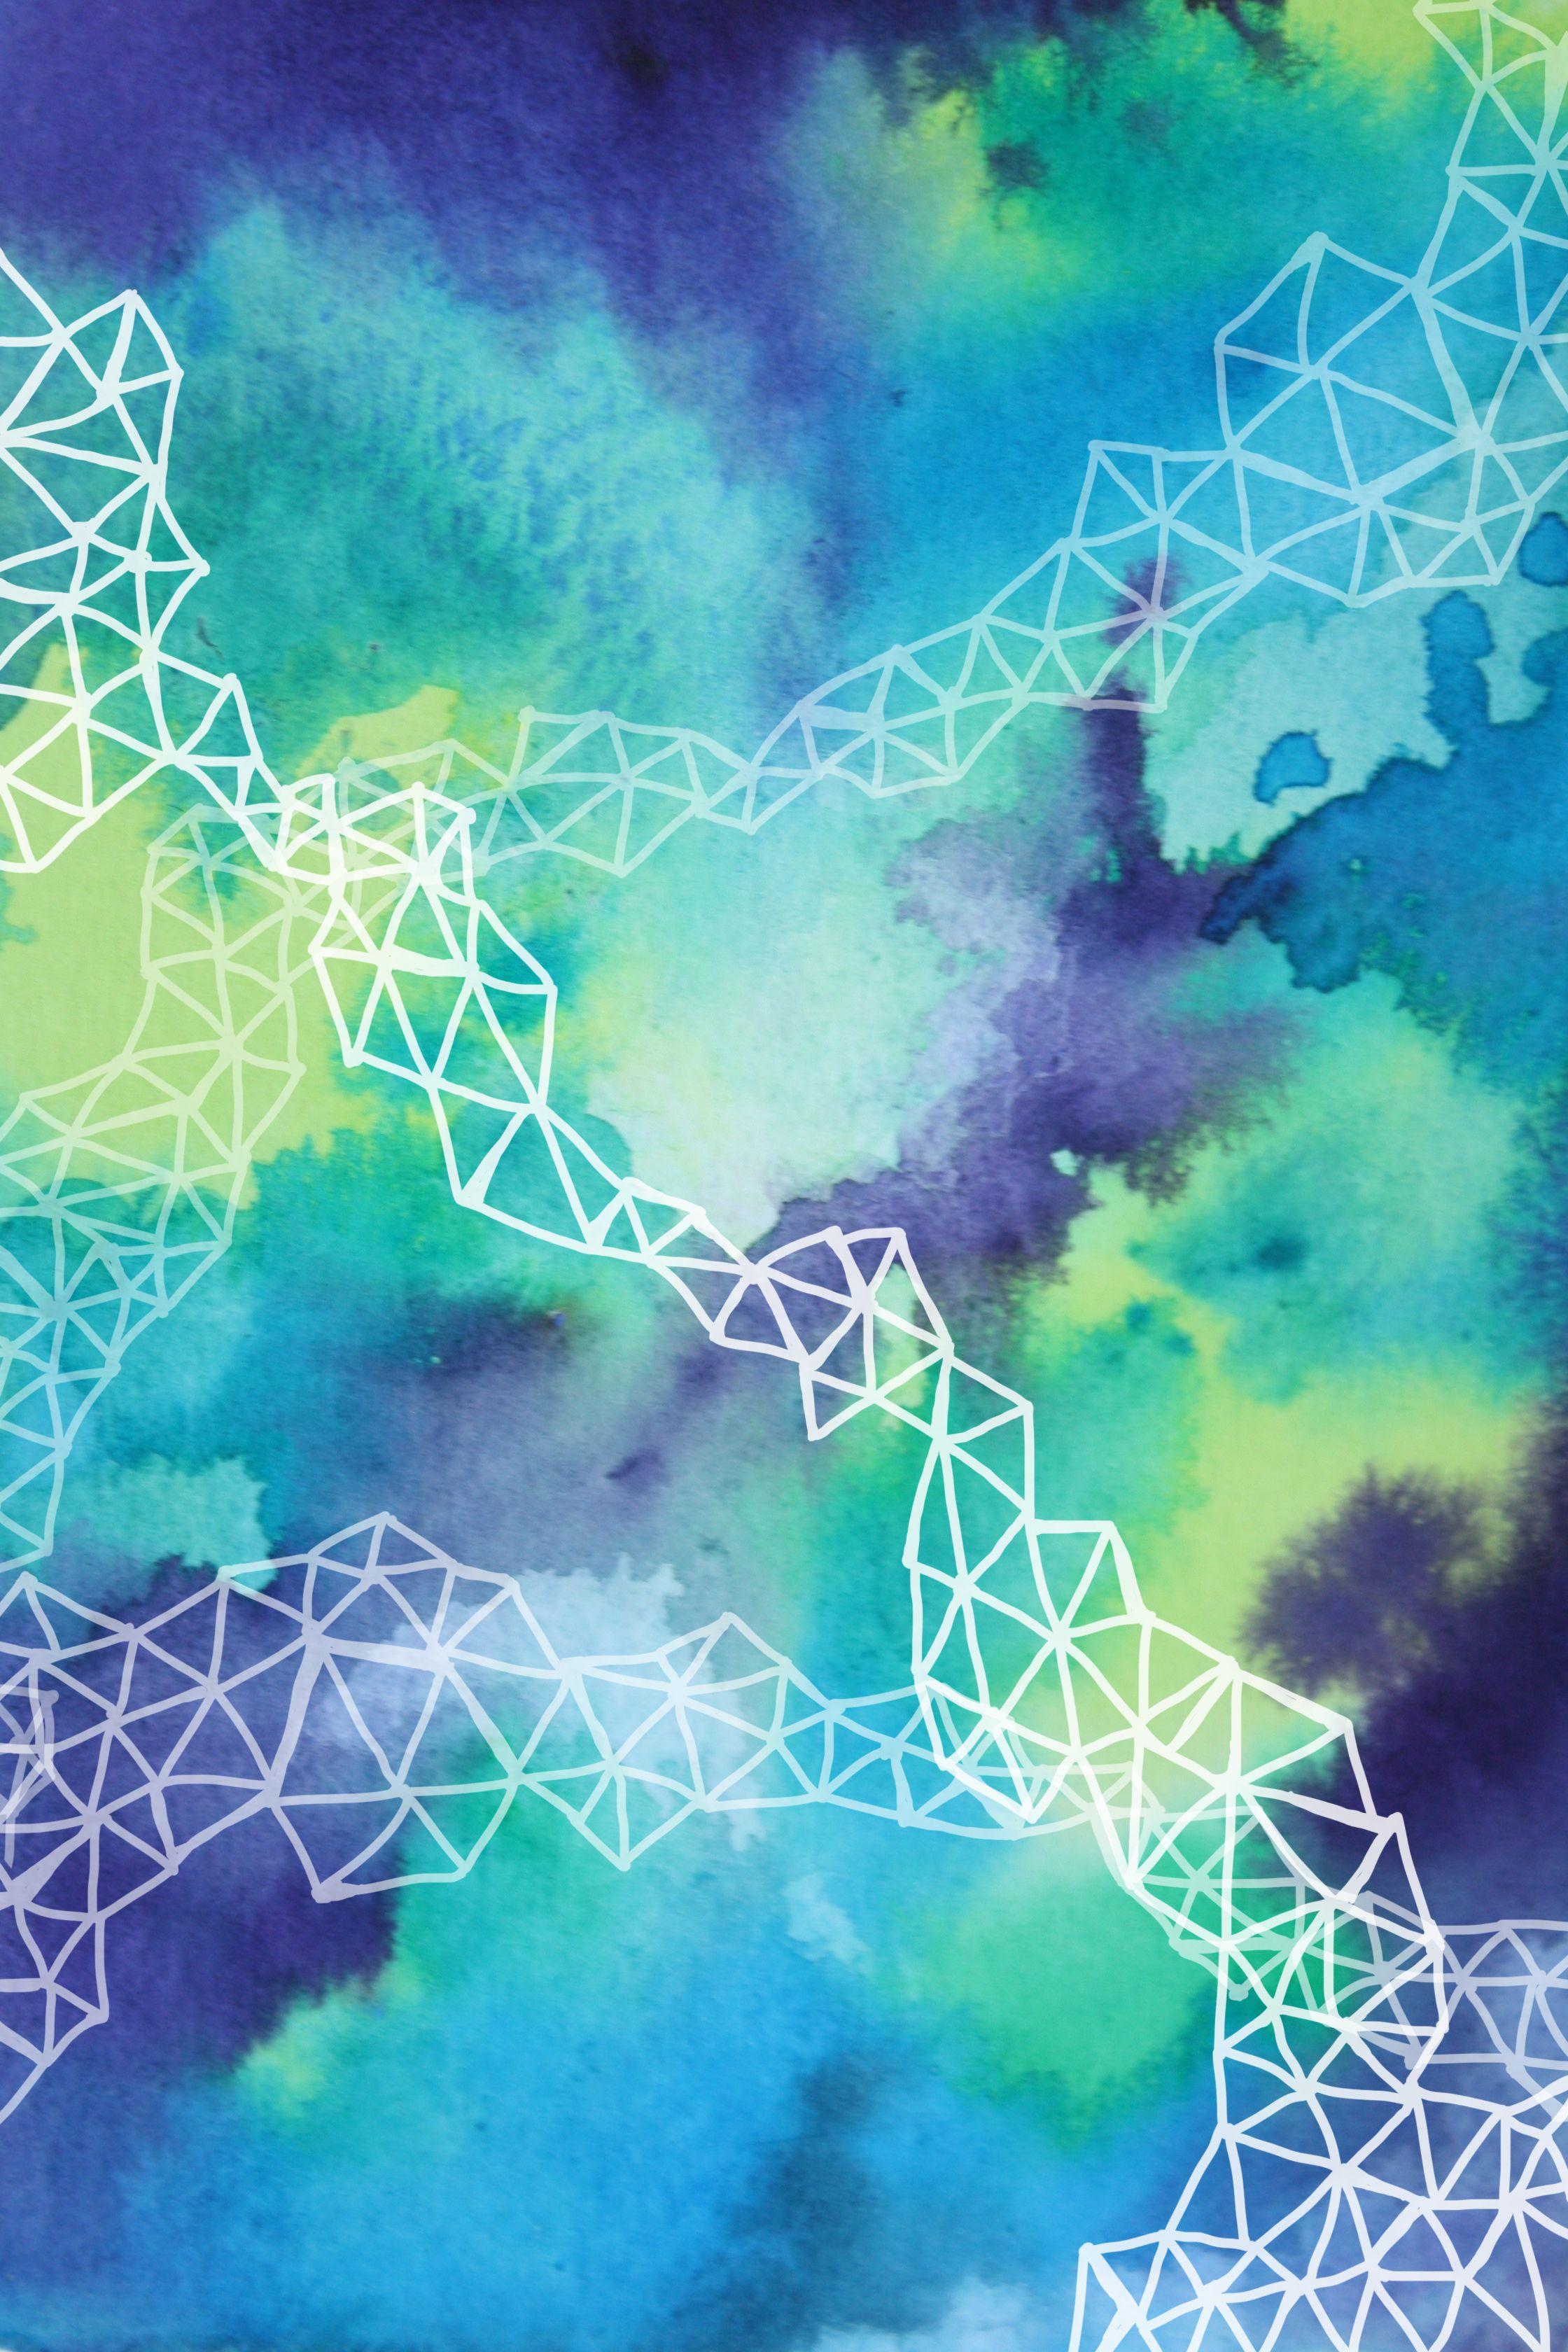 Watercolor iPhone wallpaper by Brown Bear Studio PRINTS